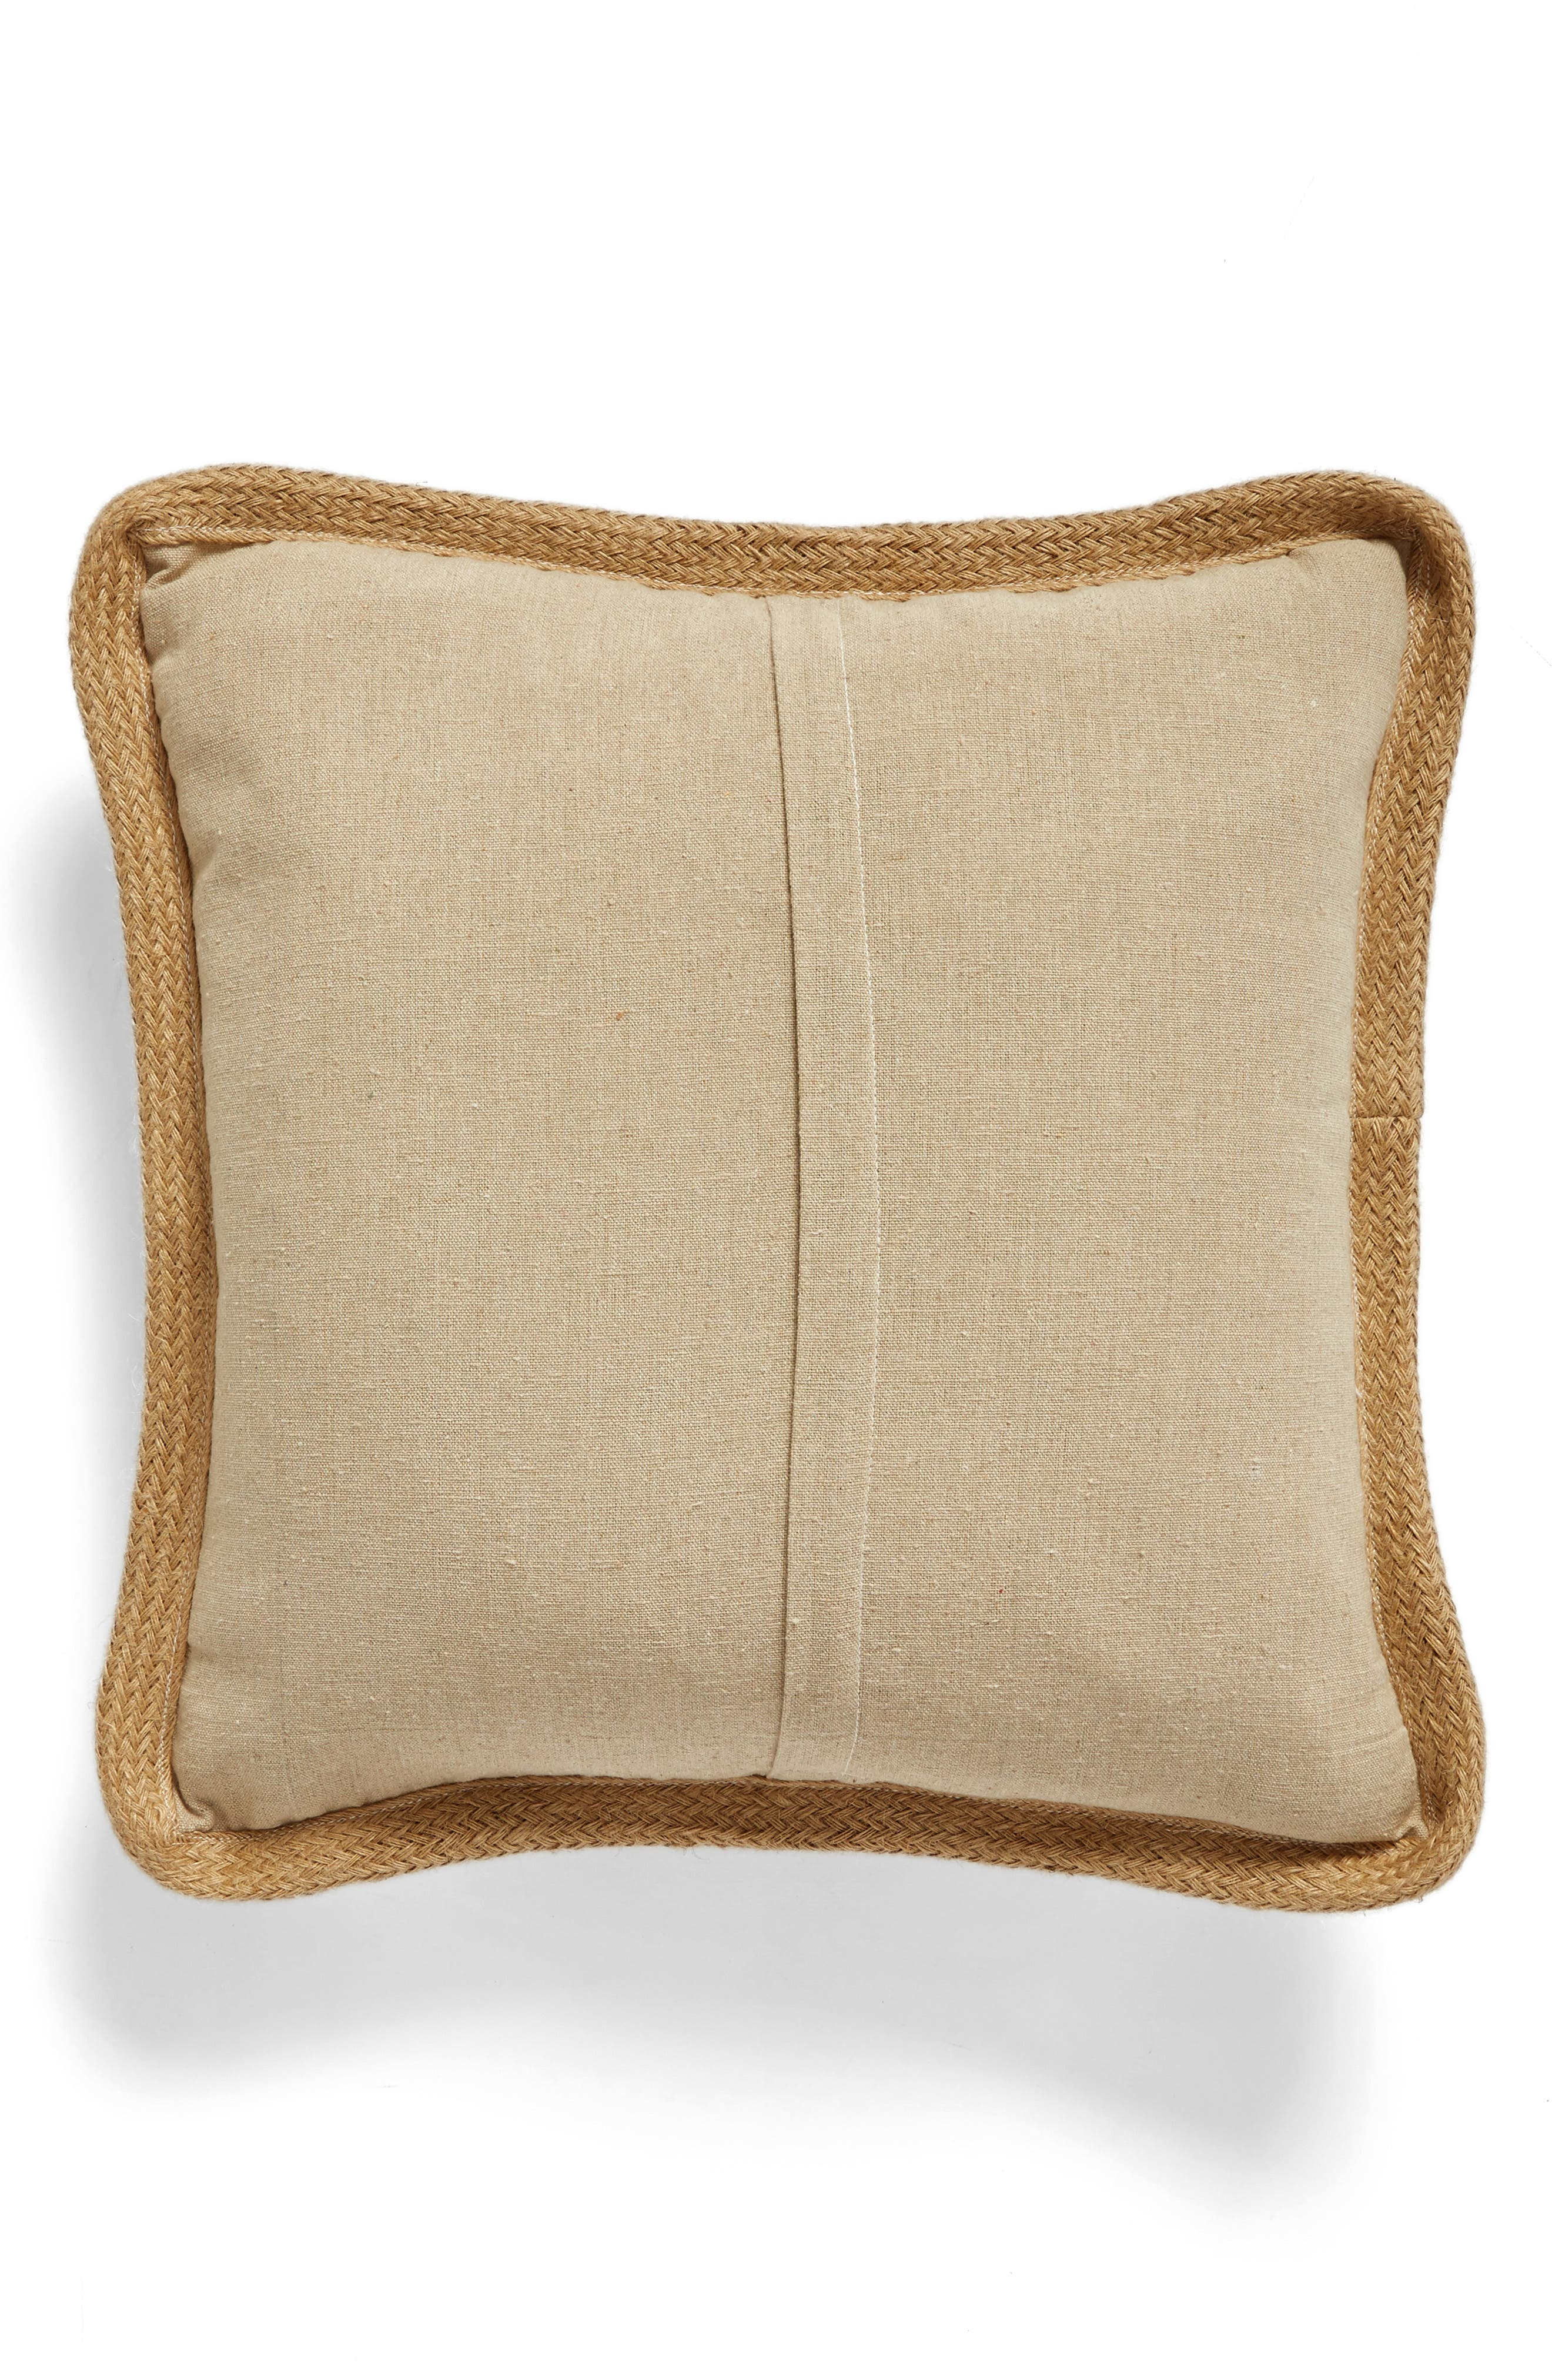 Alternate Image 2  - Levtex Pineapple Pillow